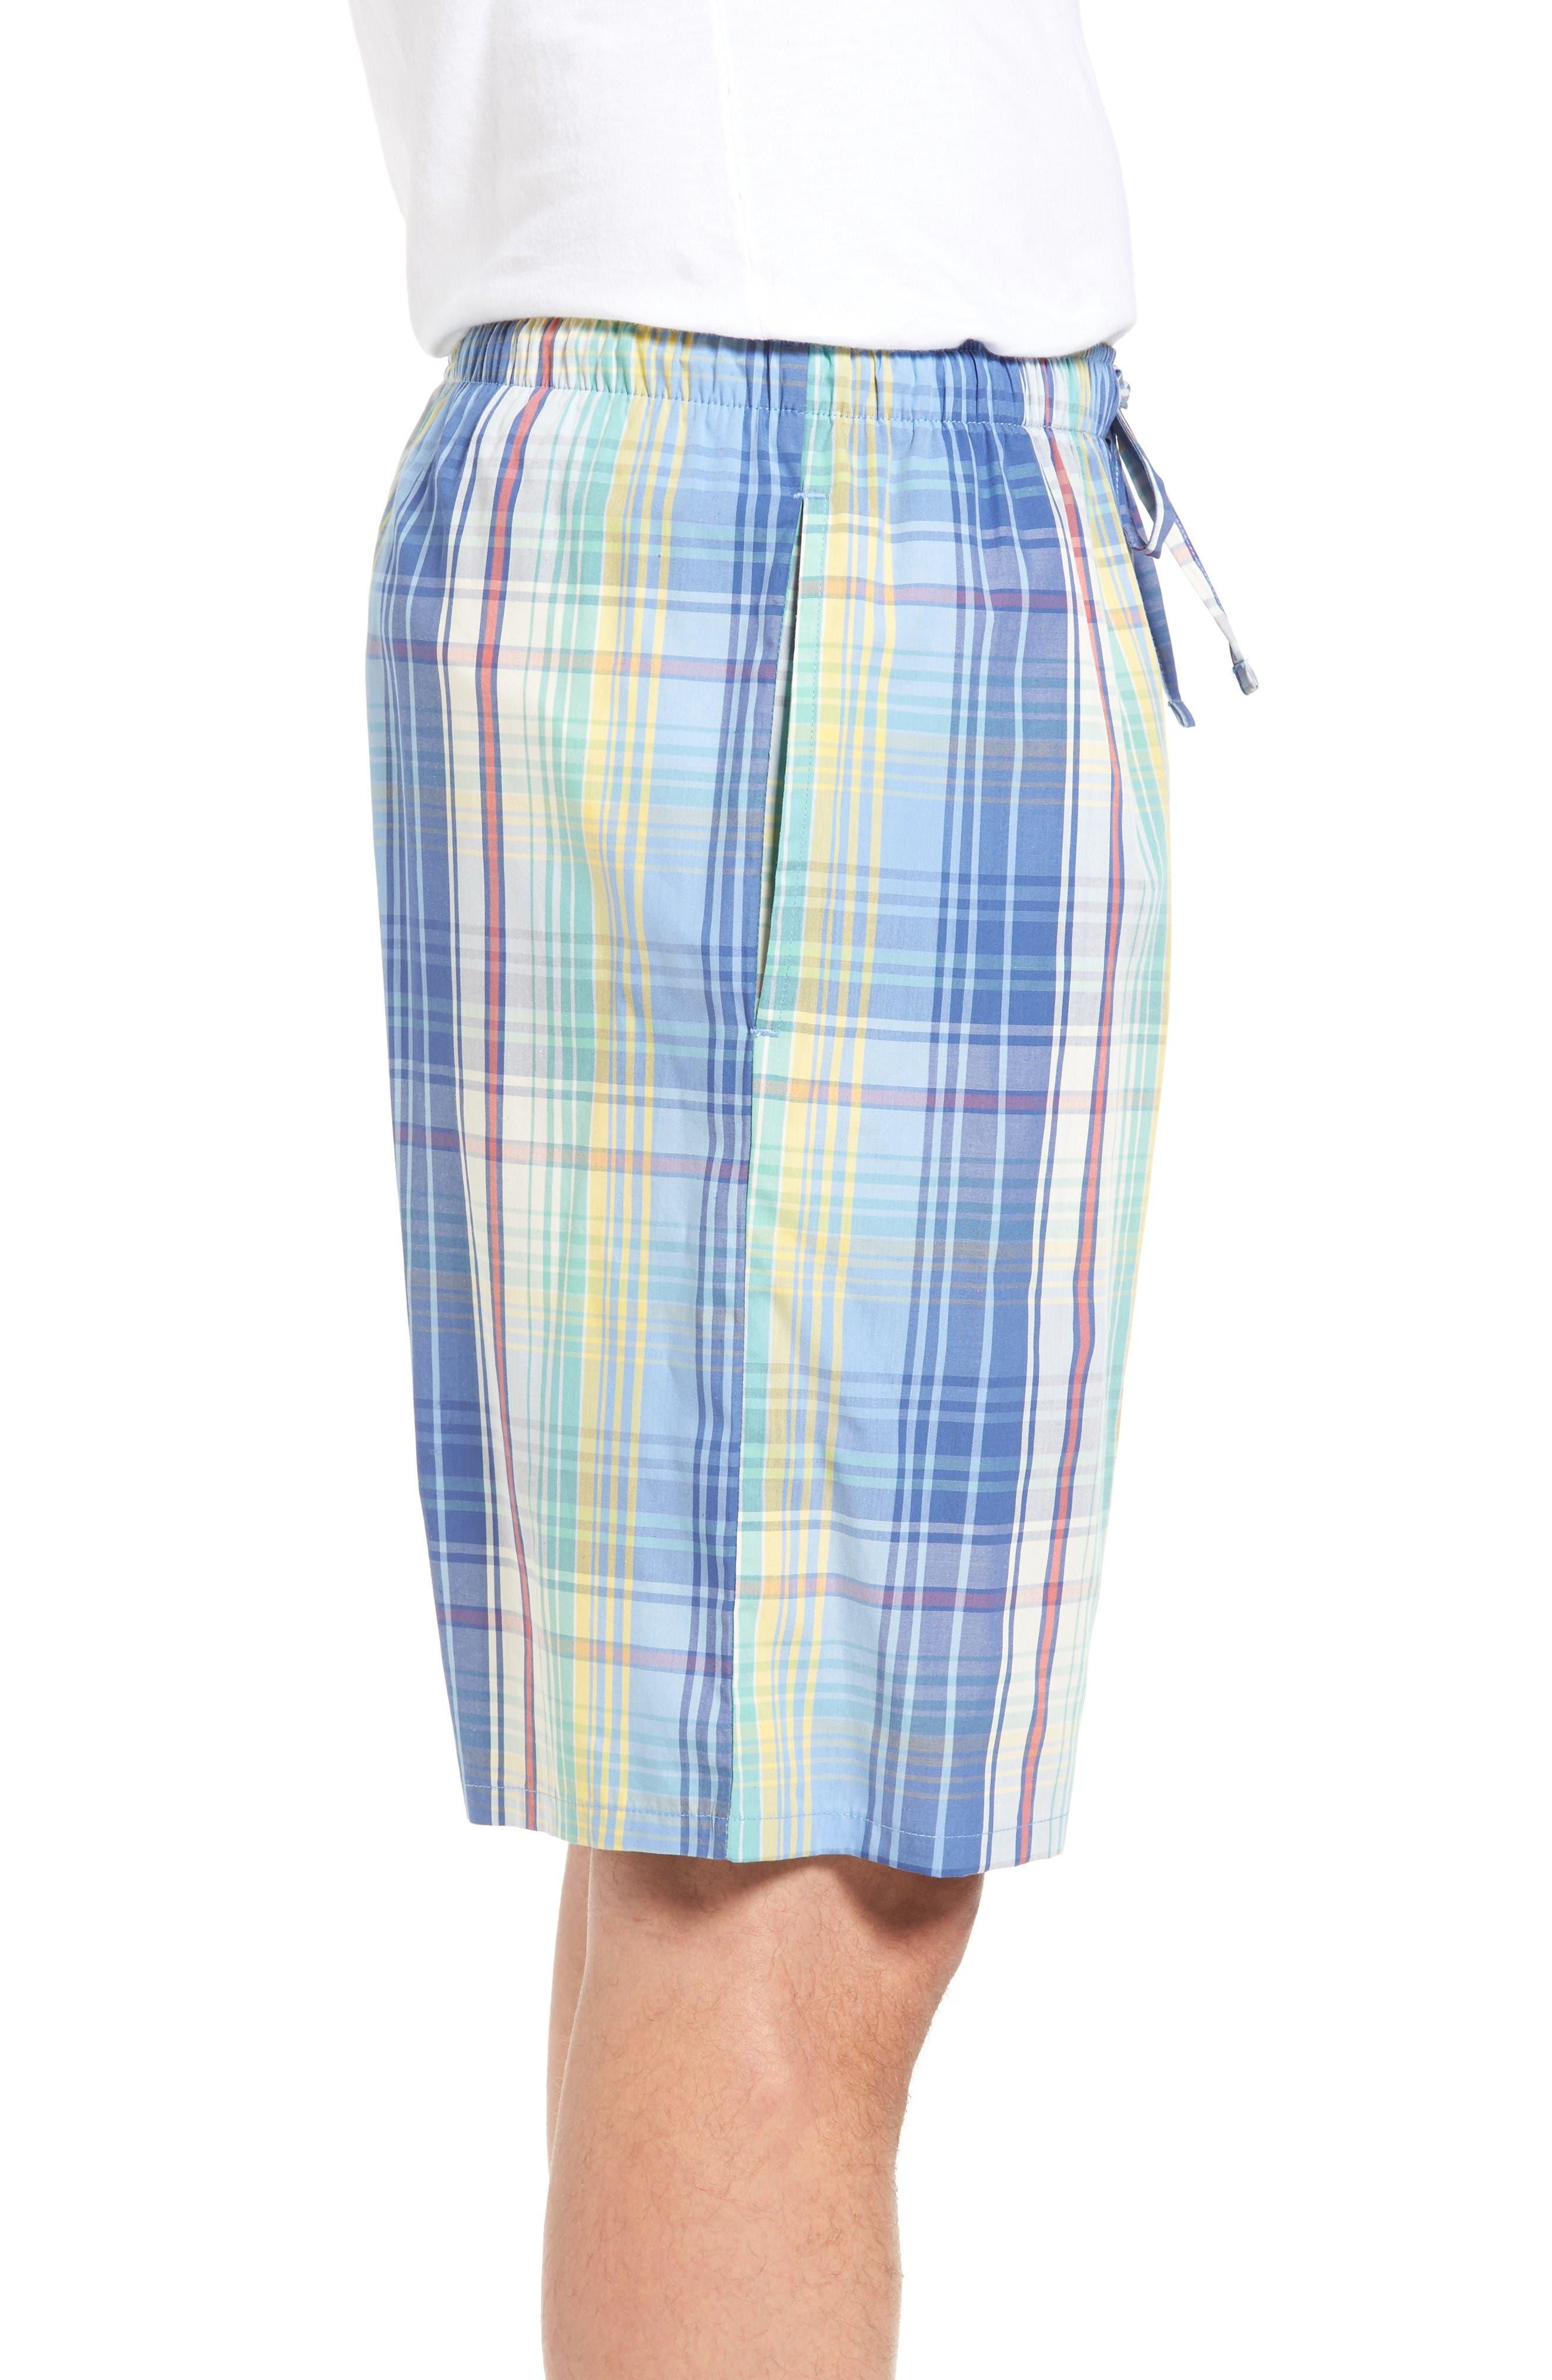 Cotton Pajama Shorts,                             Alternate thumbnail 3, color,                             Avery Plaid